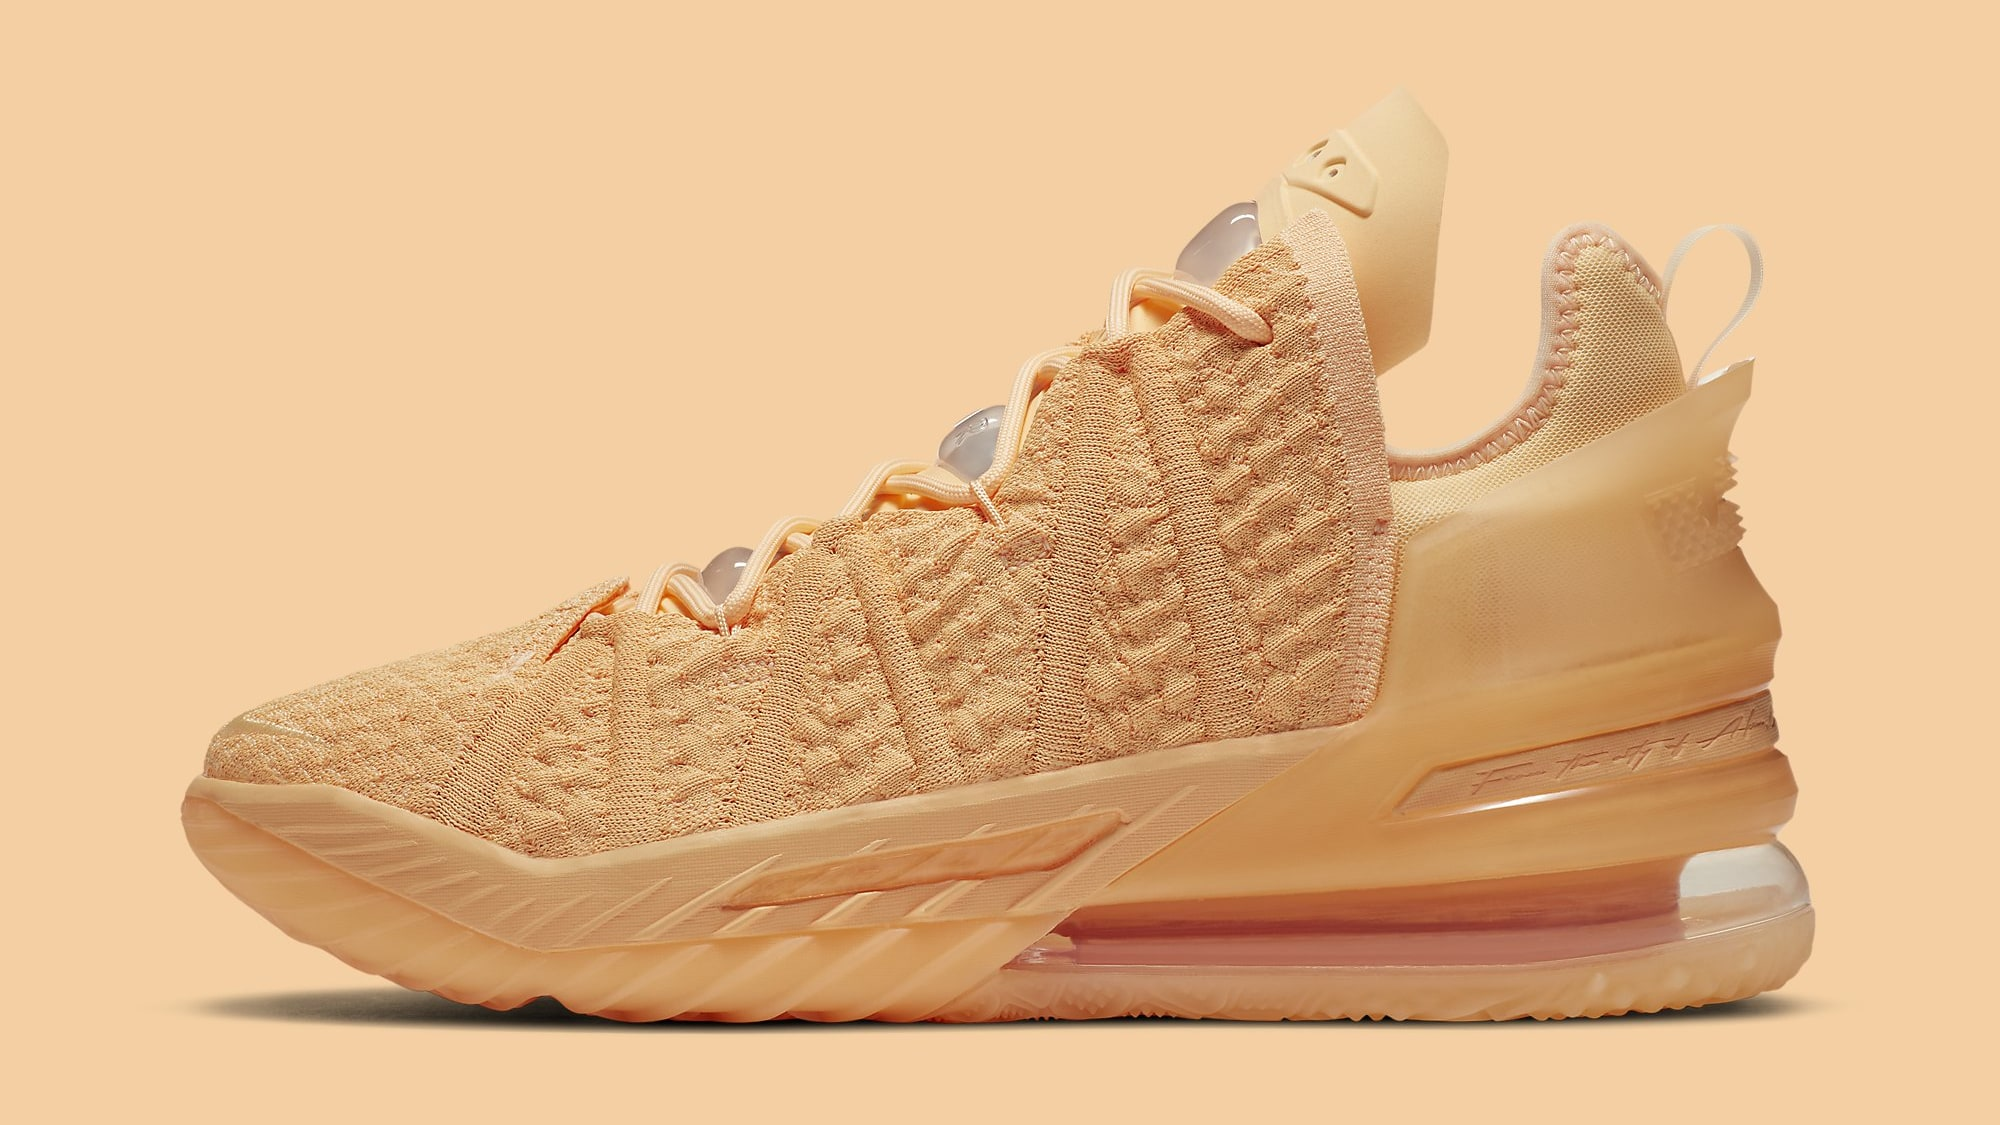 Nike LeBron 18 'Melon Tint' DB8148-801 Lateral